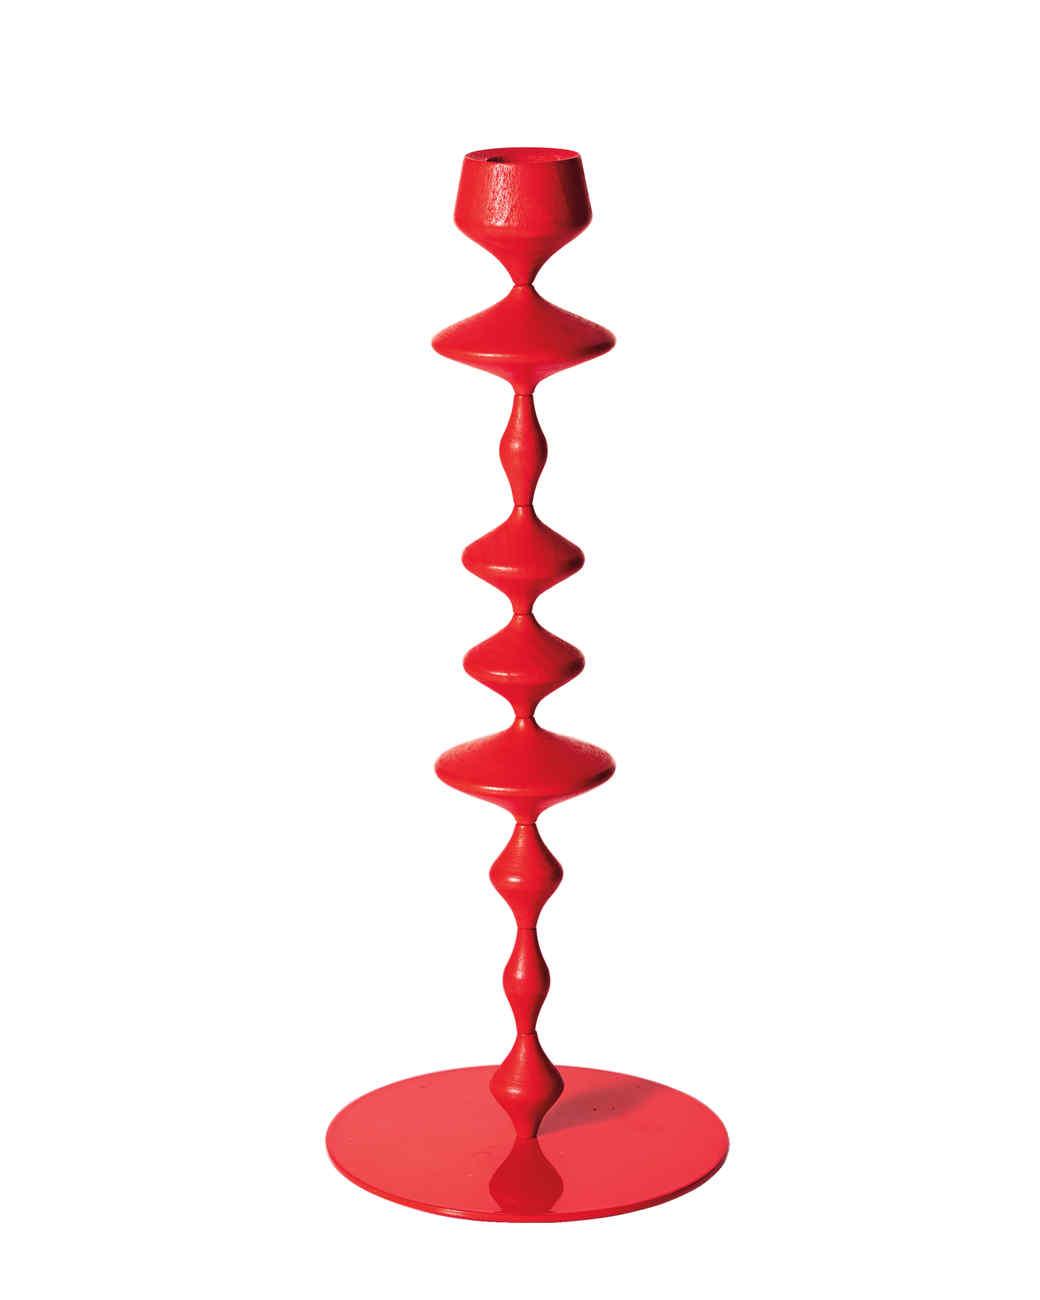 a-plus-r-candlesticks-002-d111478.jpg